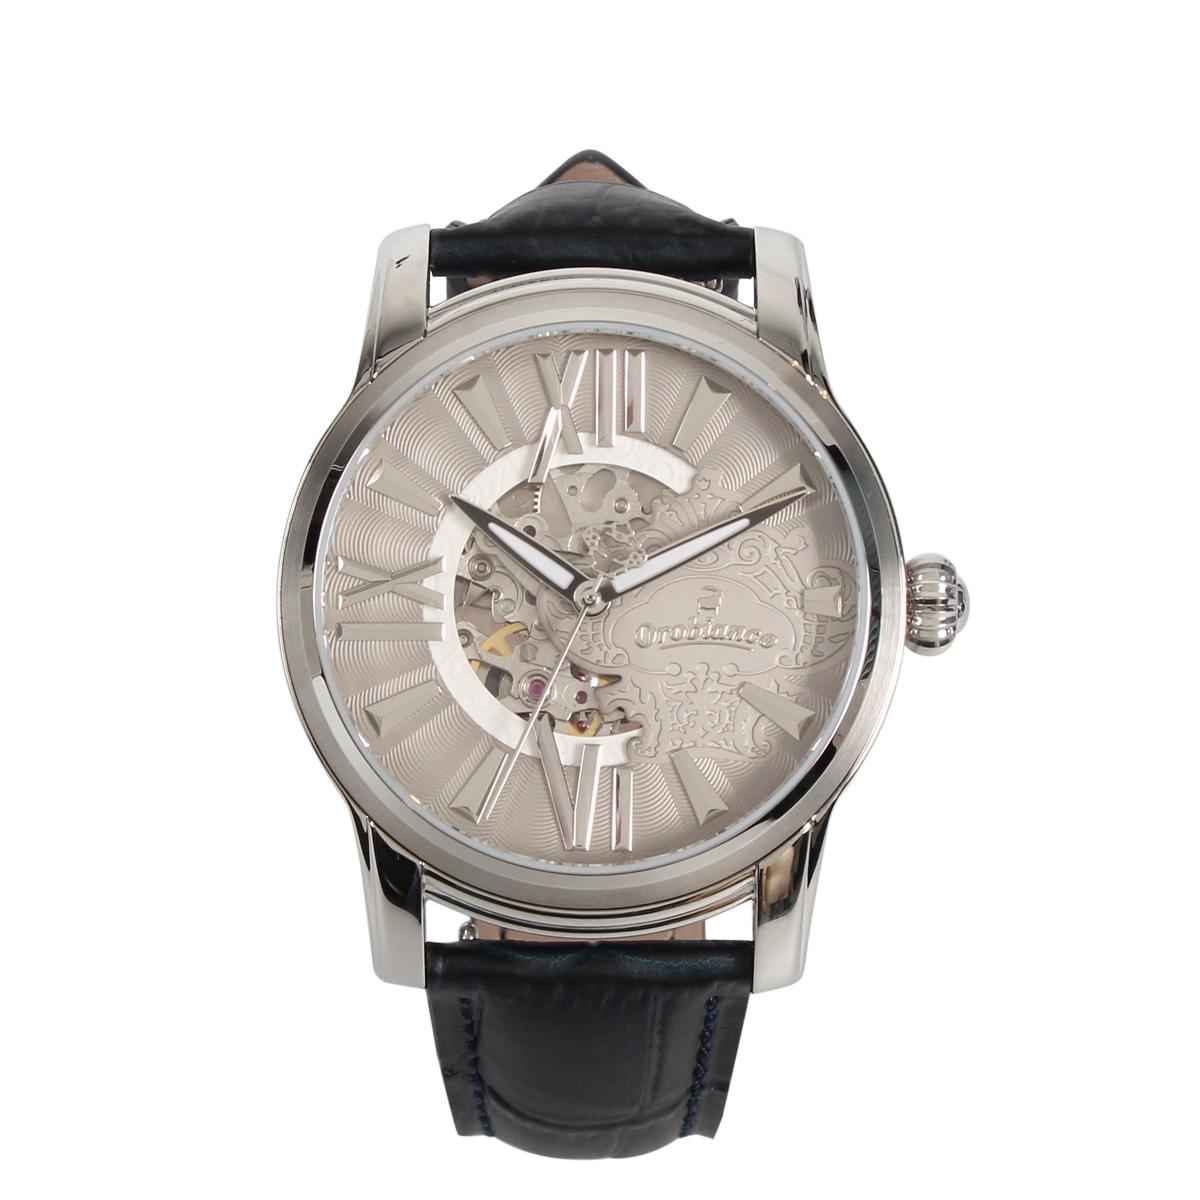 Orobianco ORAKLASSICA オロビアンコ 腕時計 メンズ 防水 ネイビー OR-0011 [5/7 追加入荷]